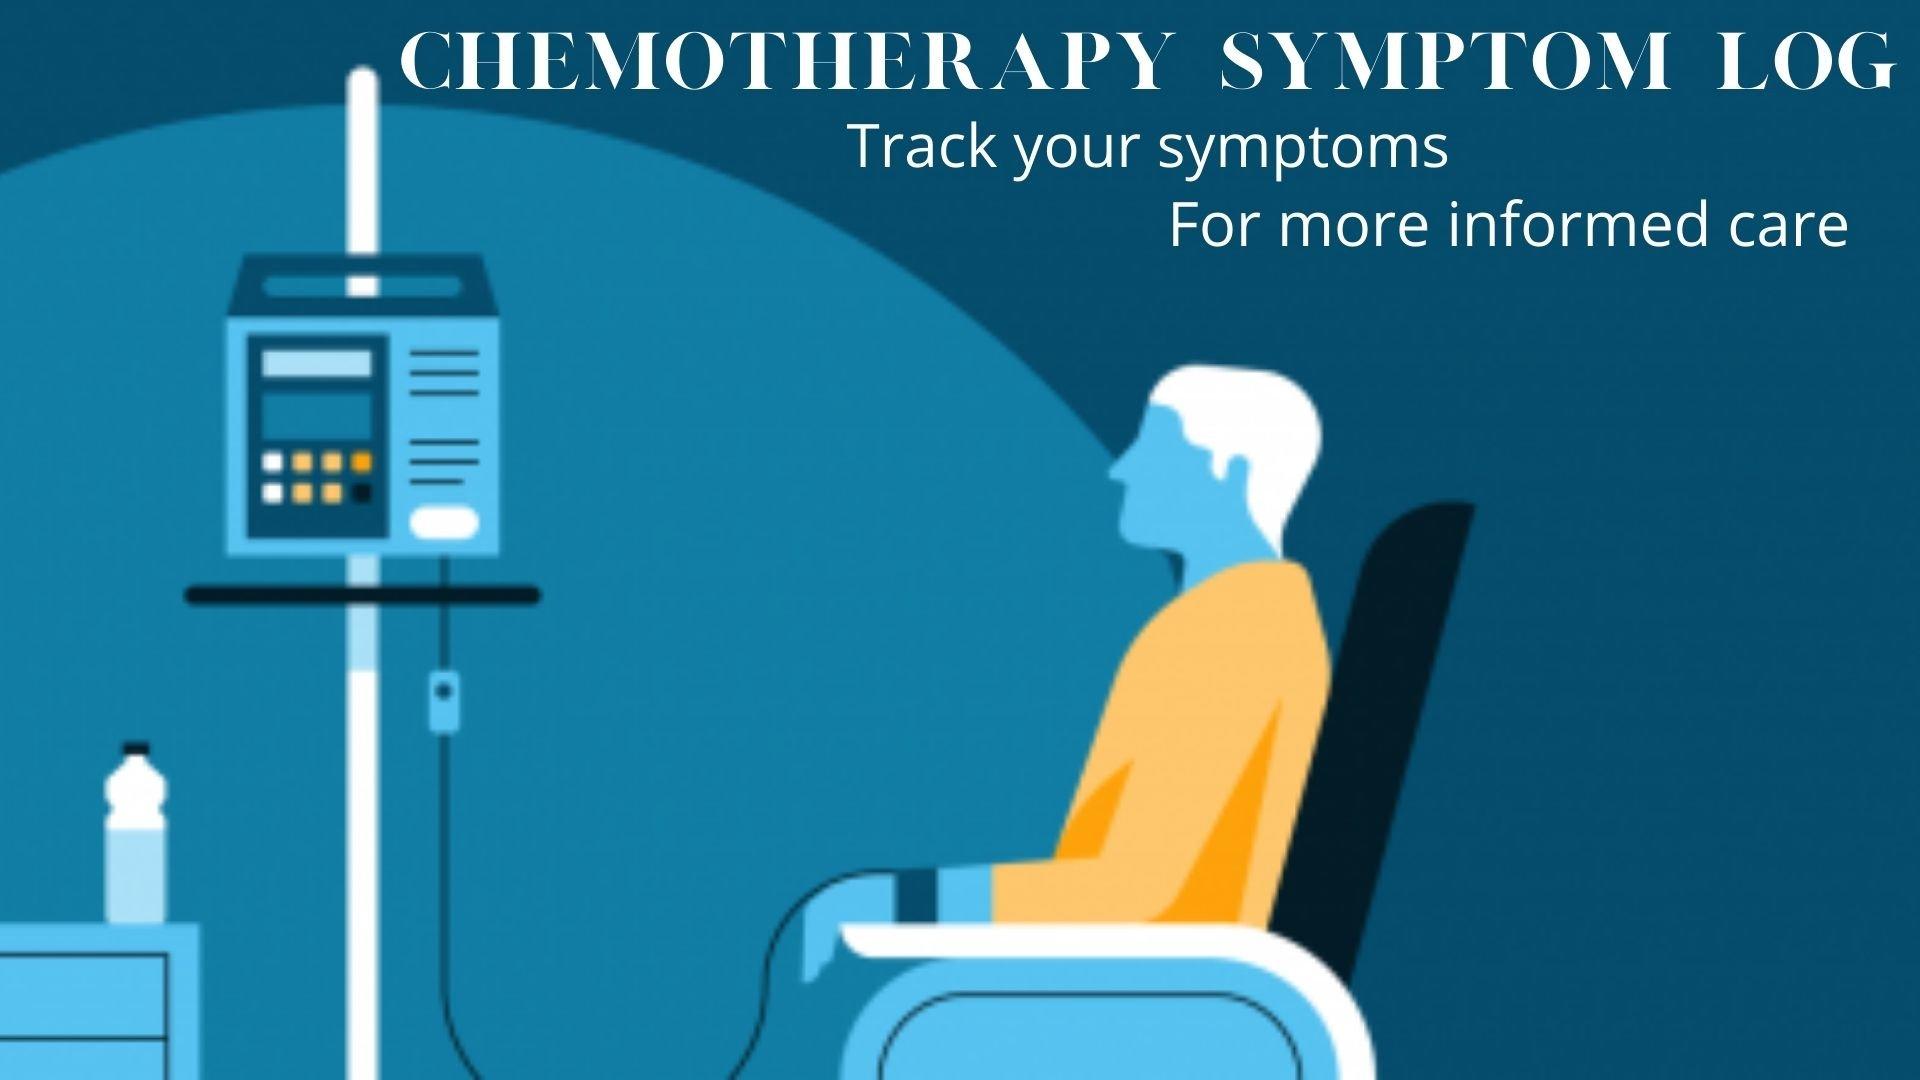 Chemotherapy Symptom Log